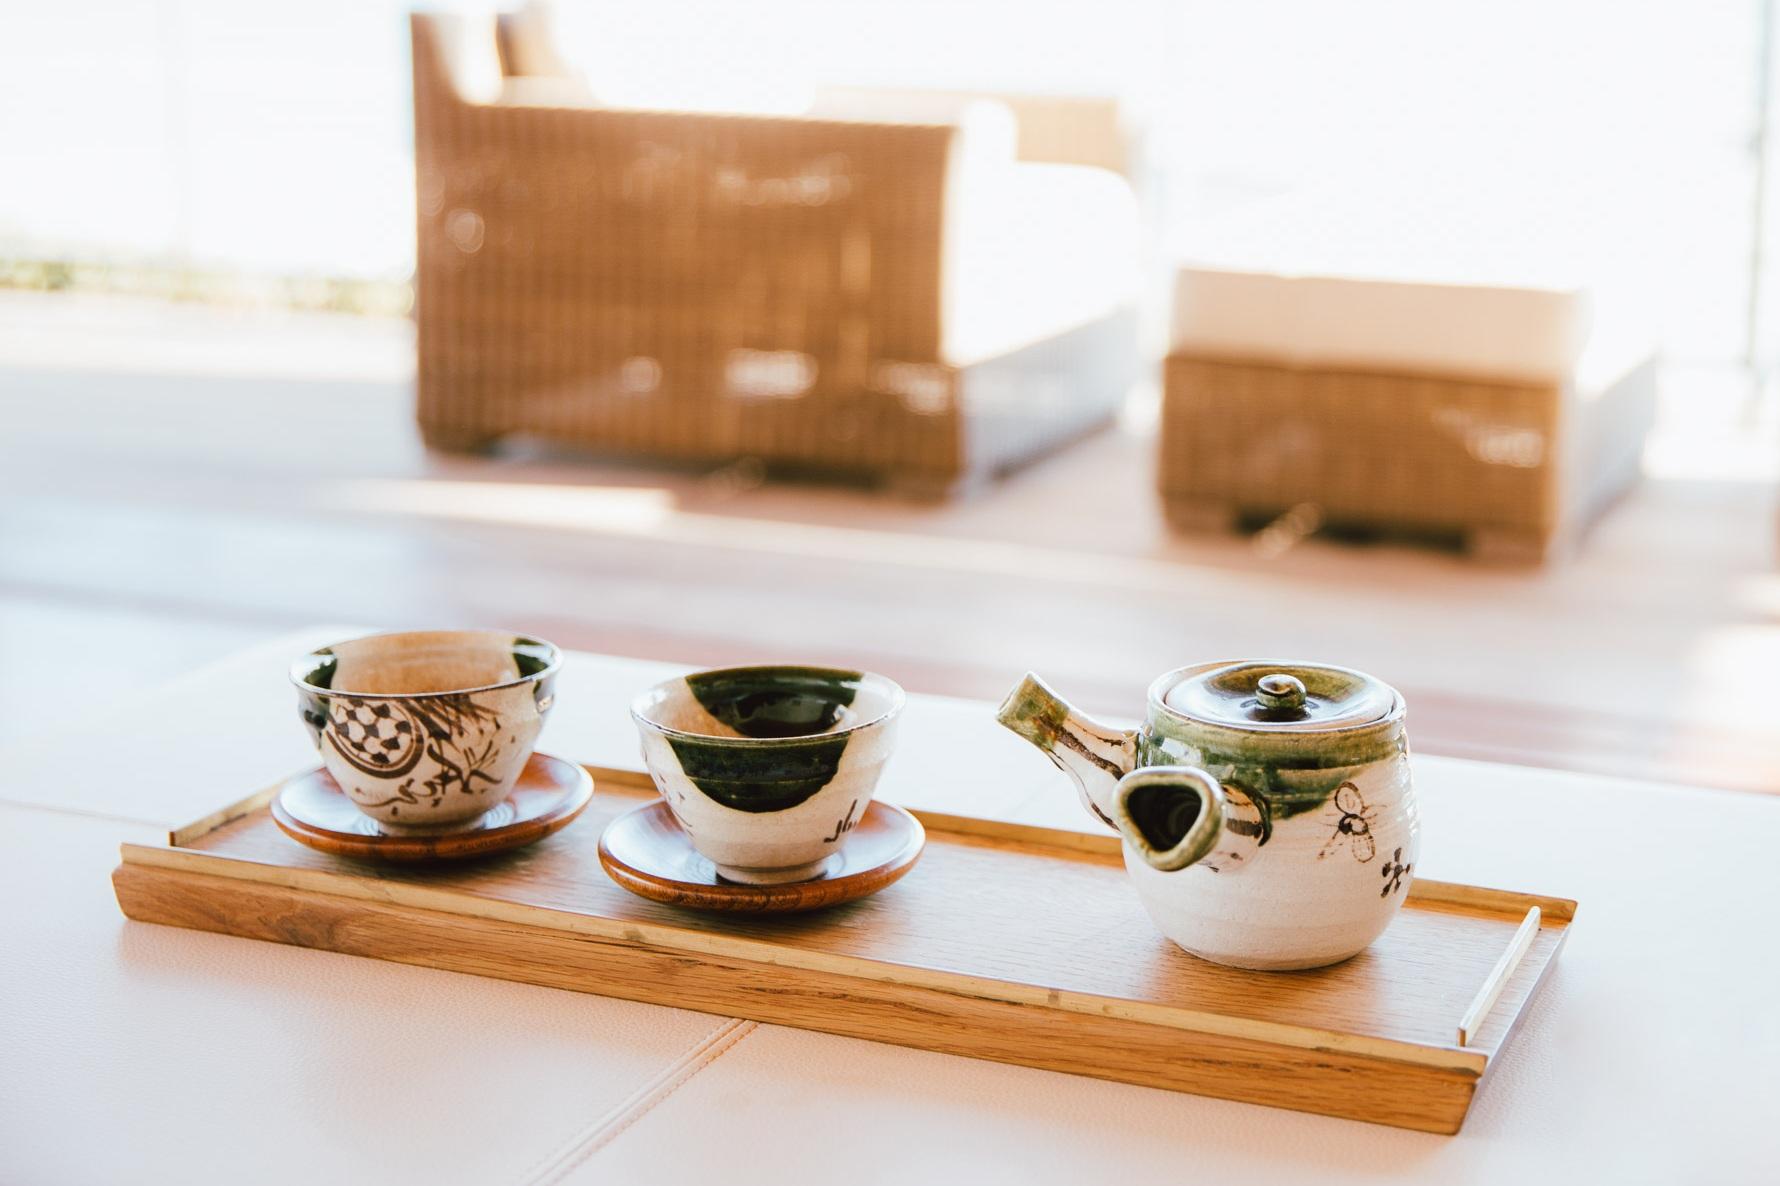 nobu-ryokan-malibu-california-luxury-hotel-photographer-los-angeles-7.jpg